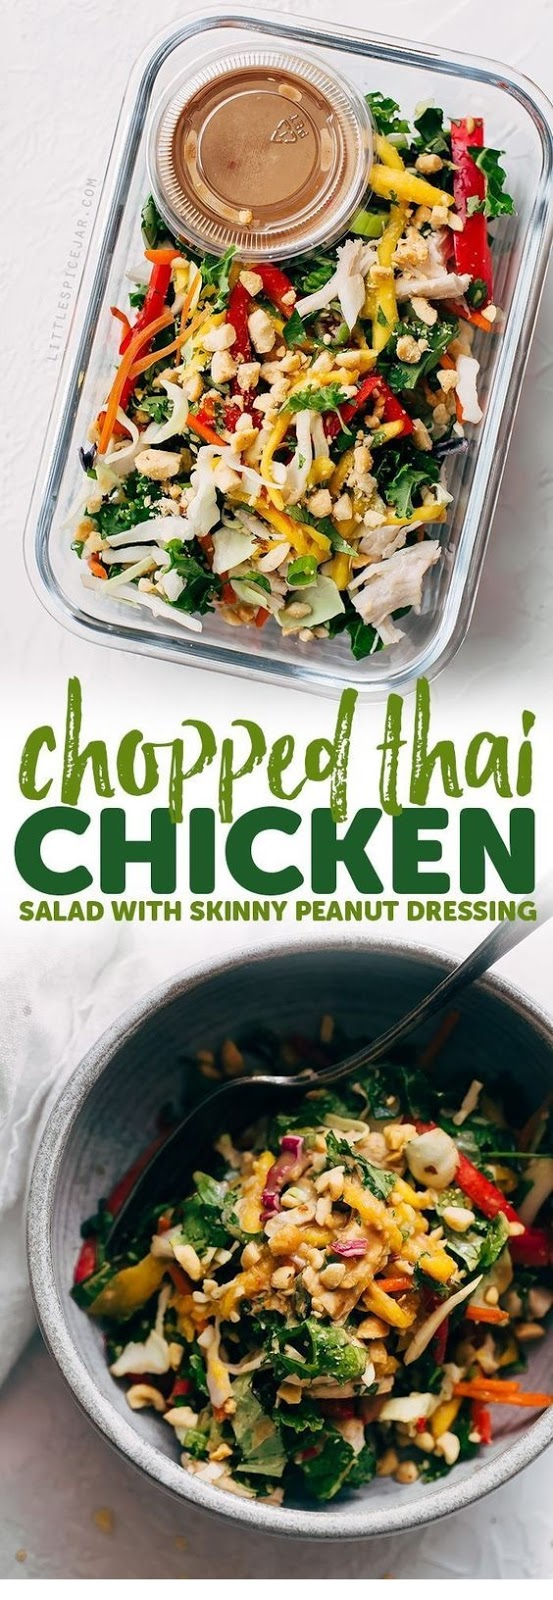 Chopped Thai Chicken Salad With Skinny Peanut Dressing